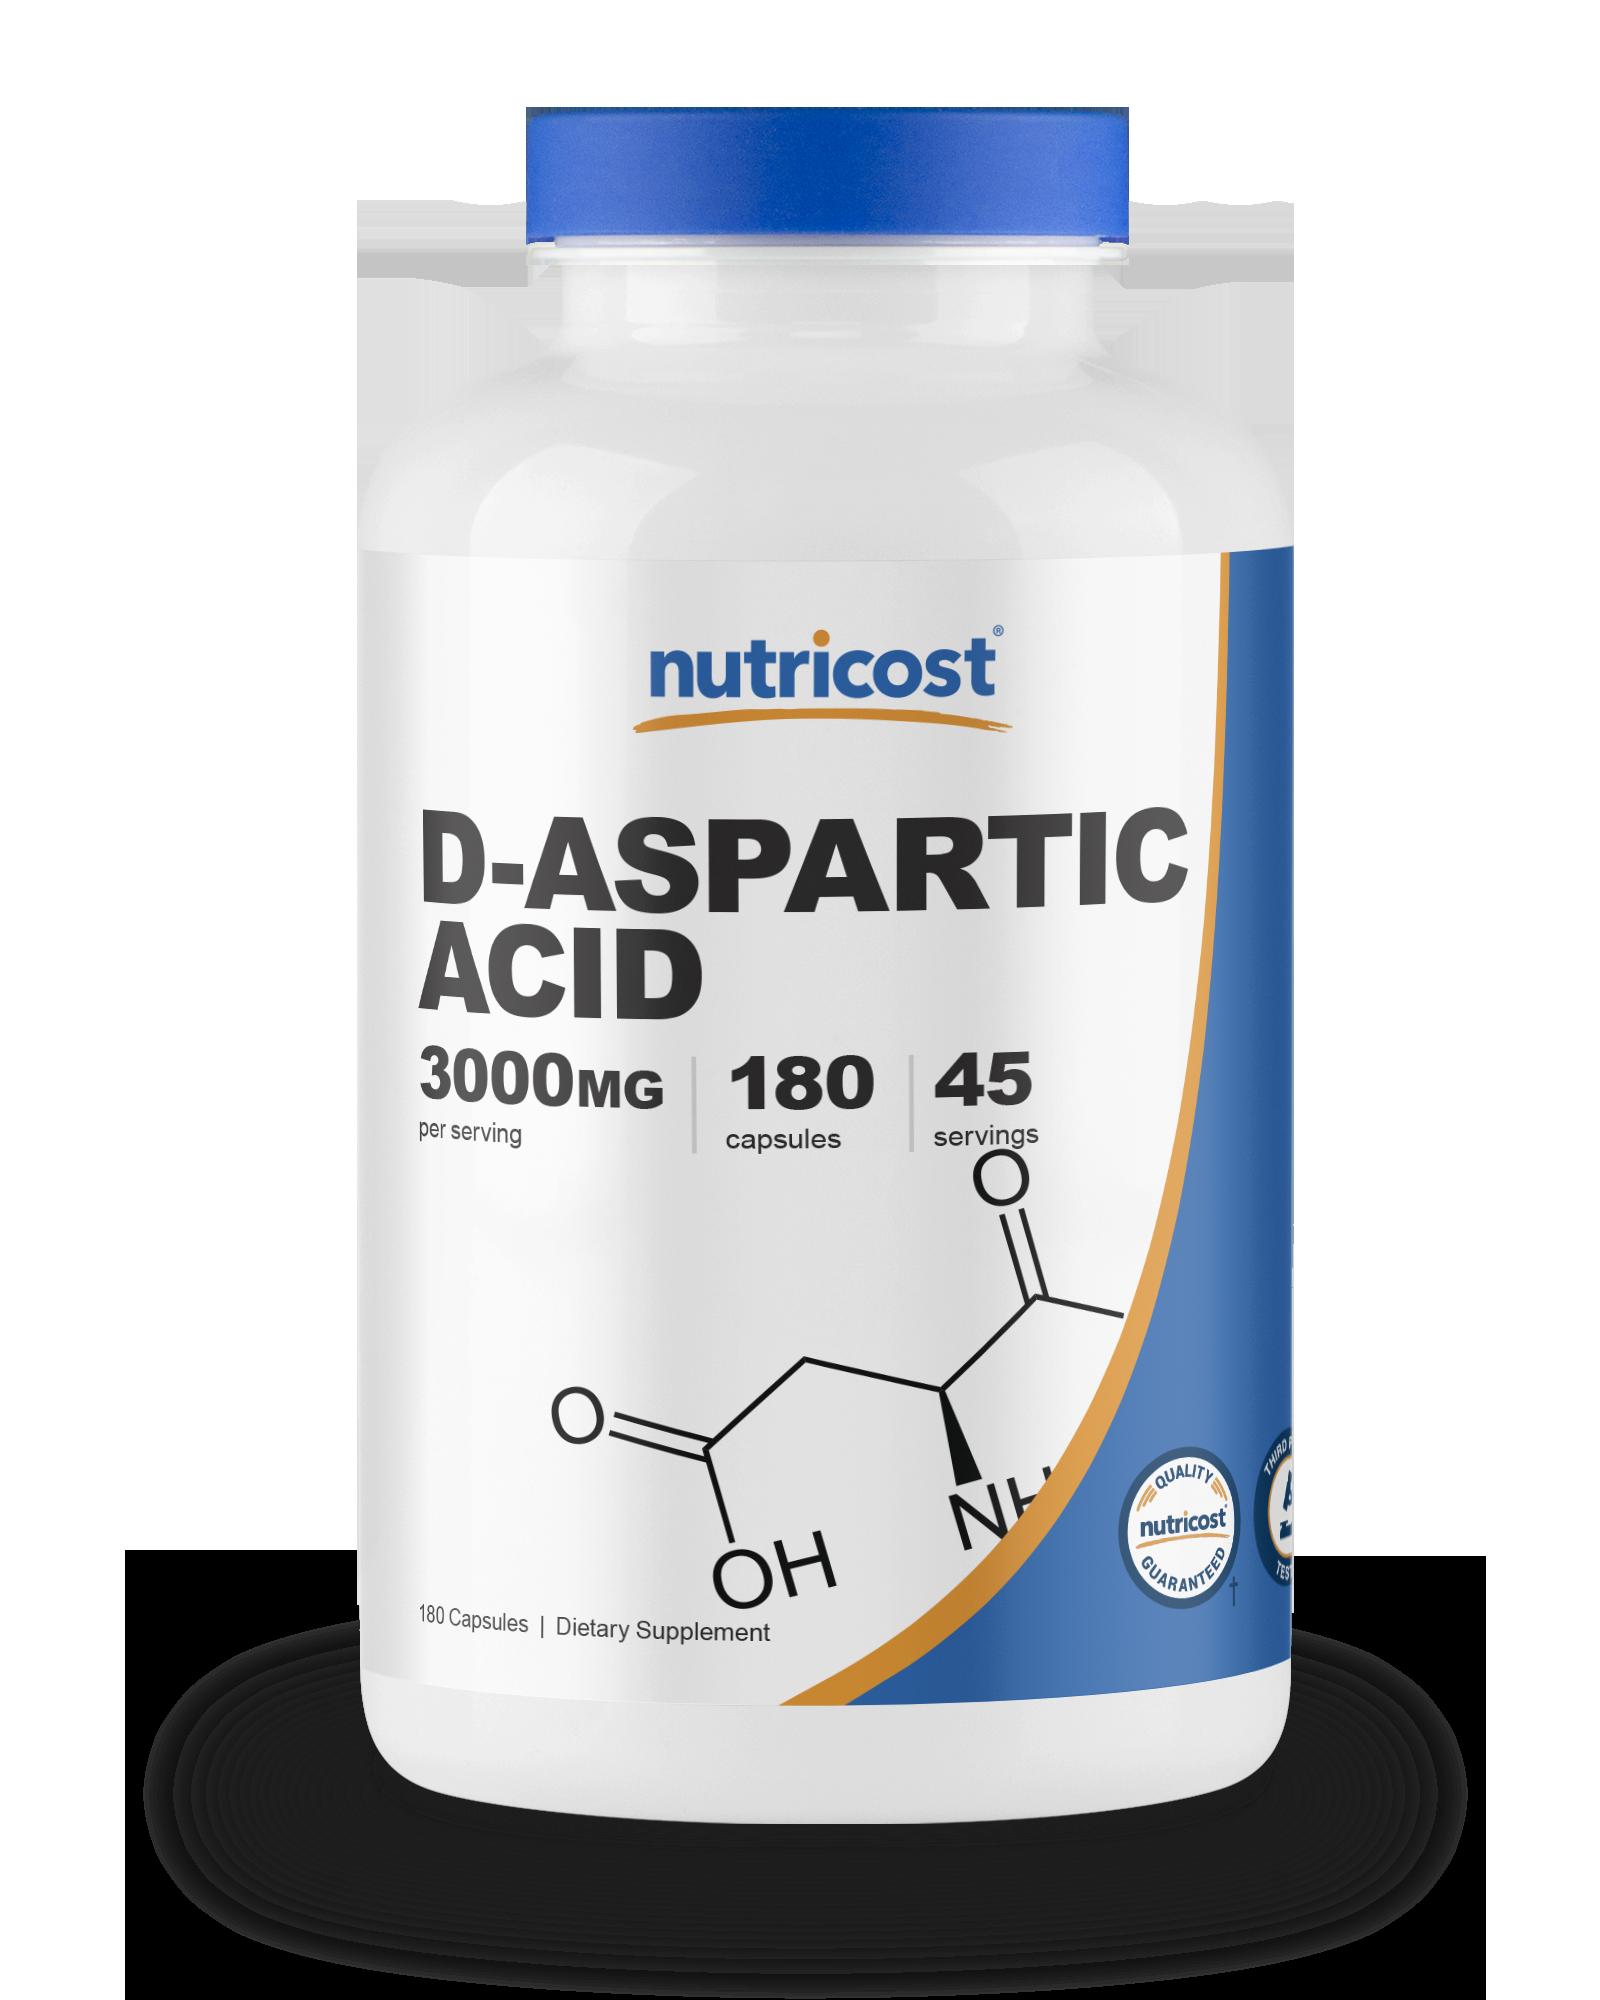 Nutricost D-aspartic acid